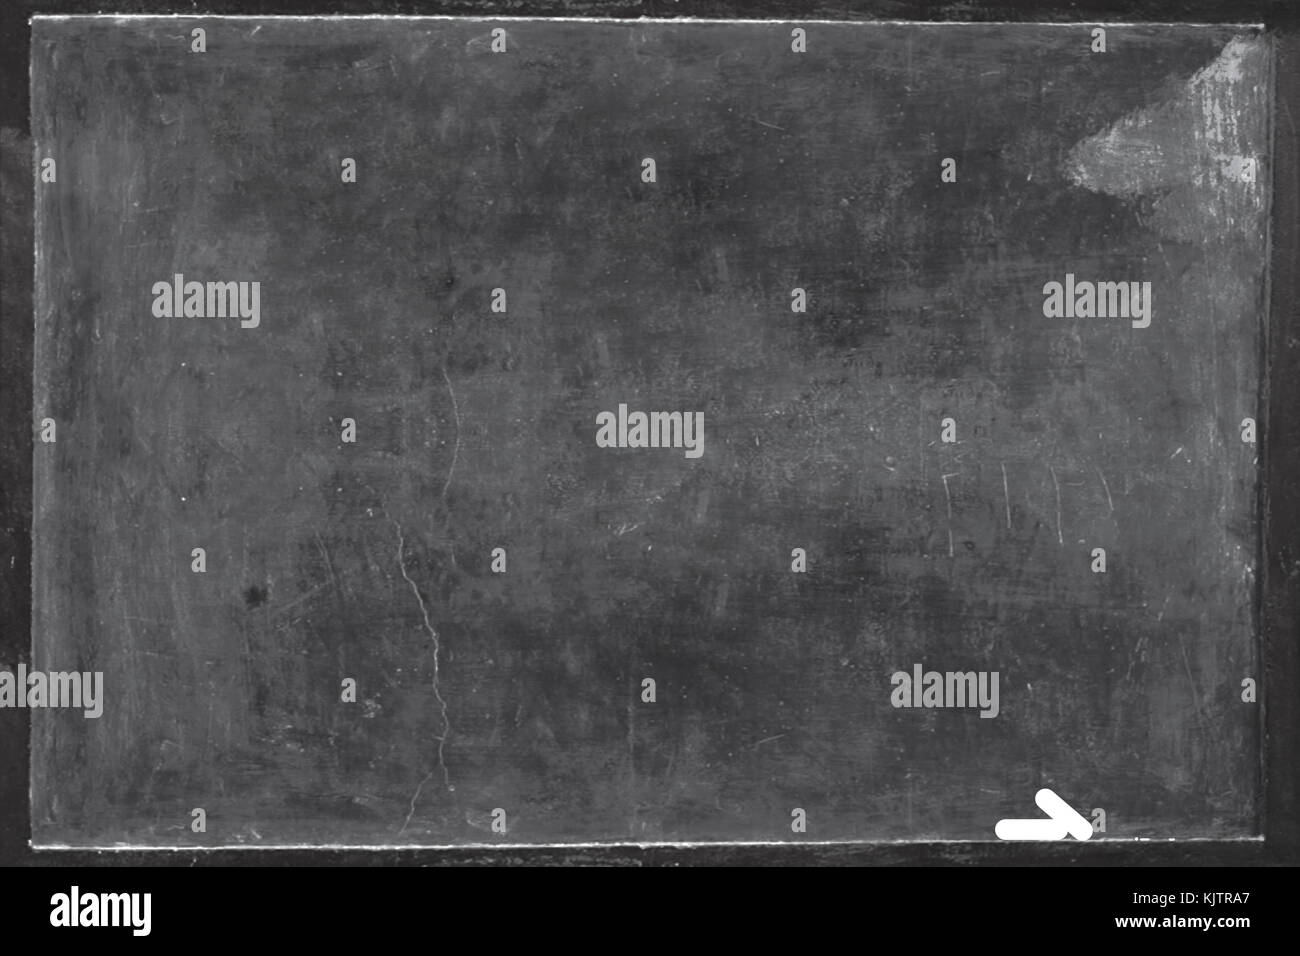 black blank chalkboard for background stock photo 166502287 alamy